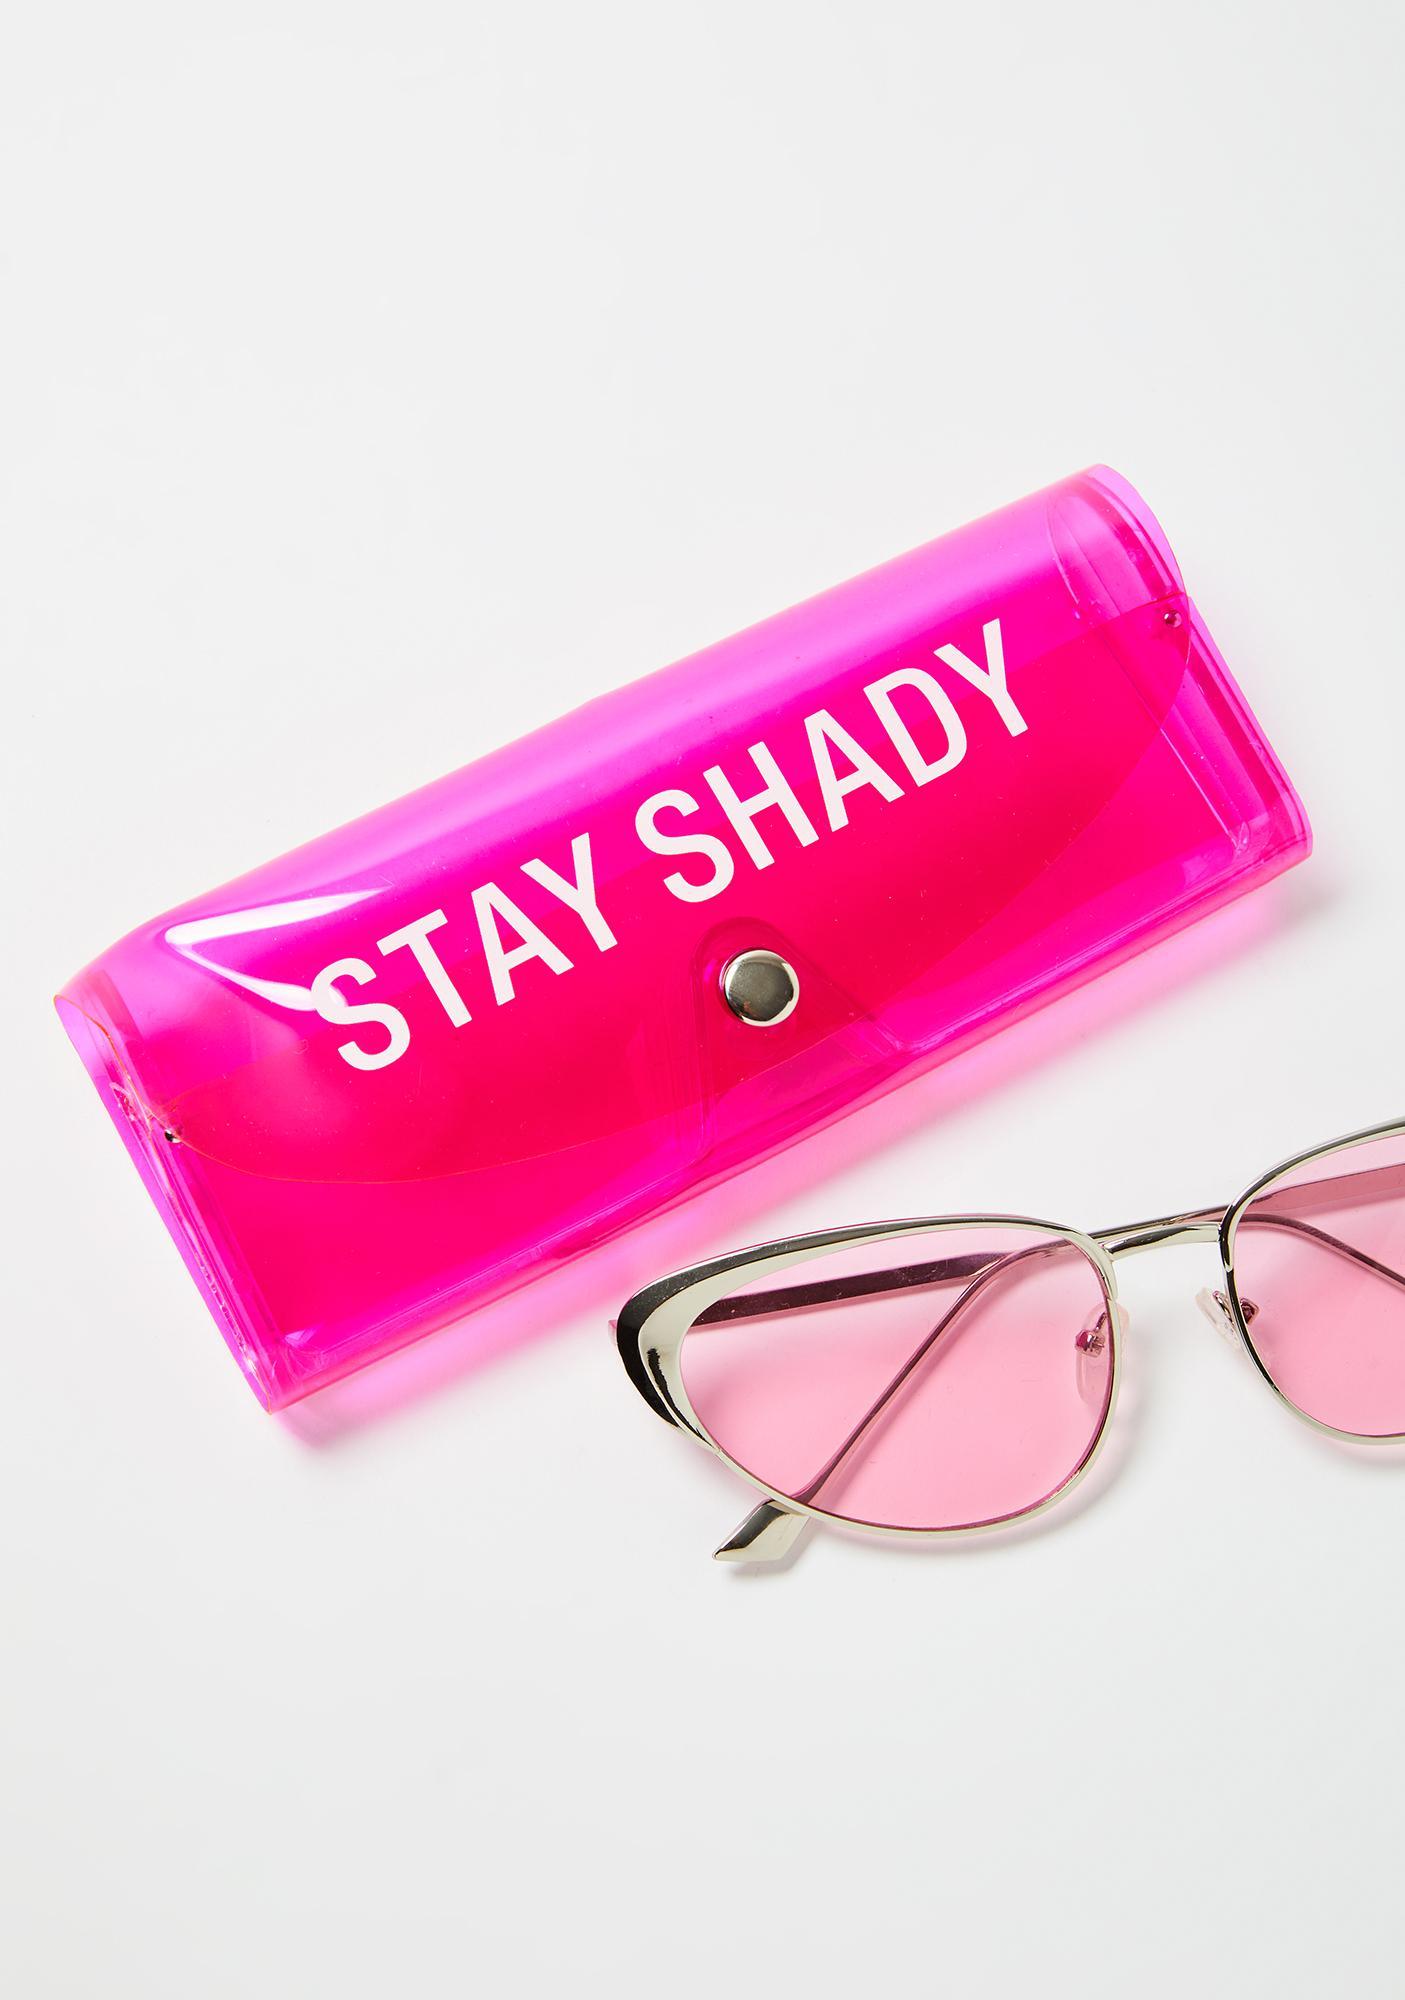 Stay Shady Sunglasses Case